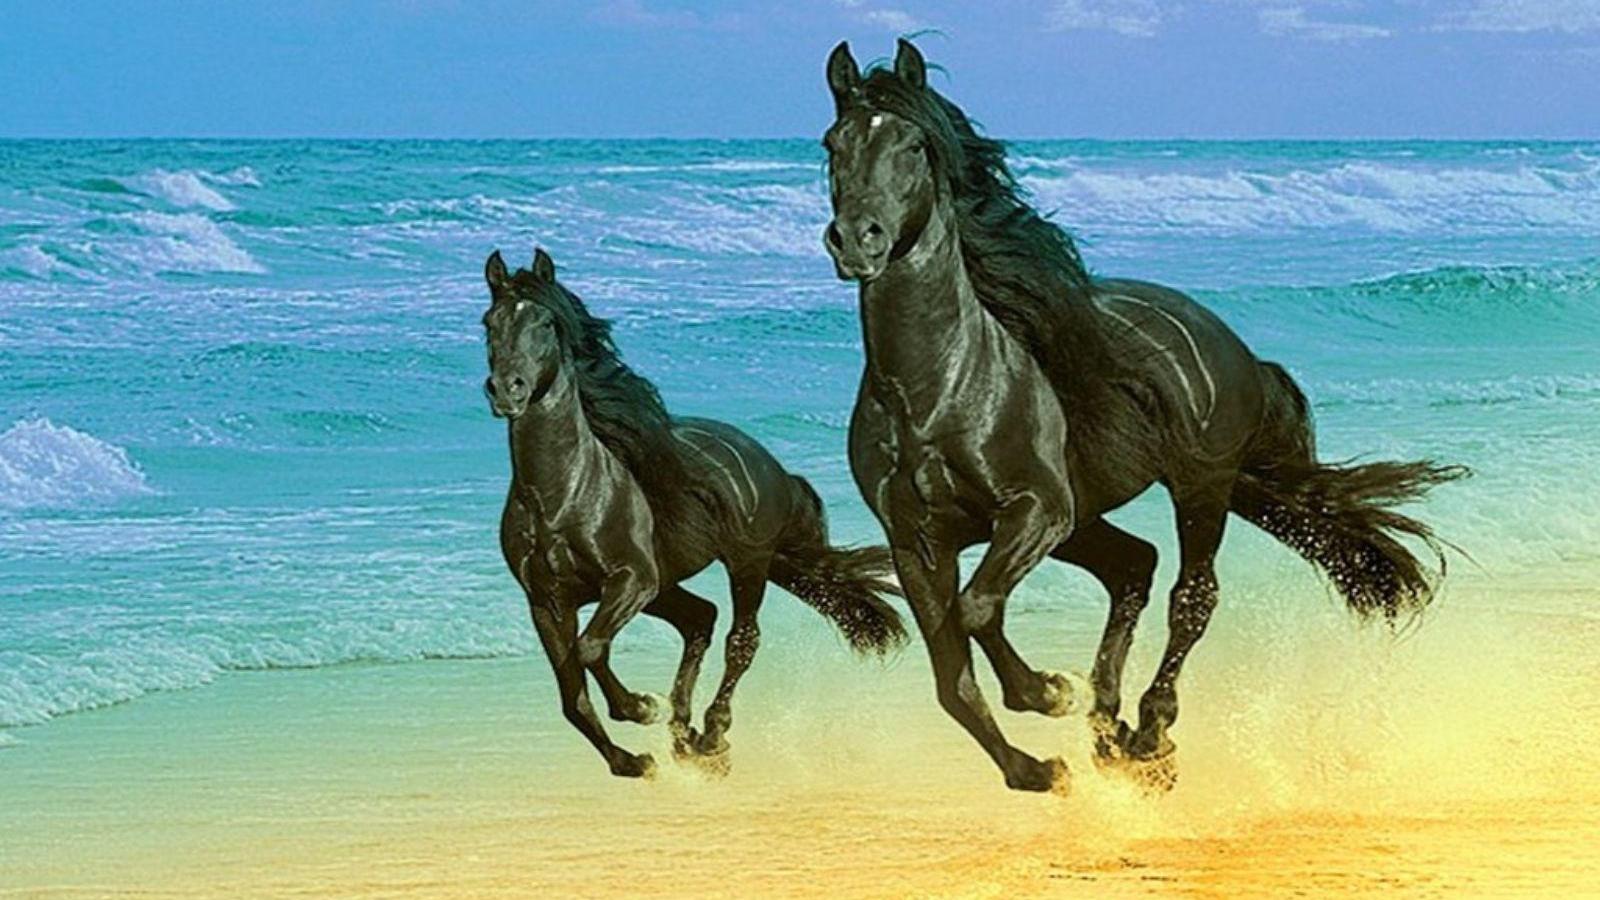 Free Download Walking Wallpaper Black Colourful Horse Wallpaper